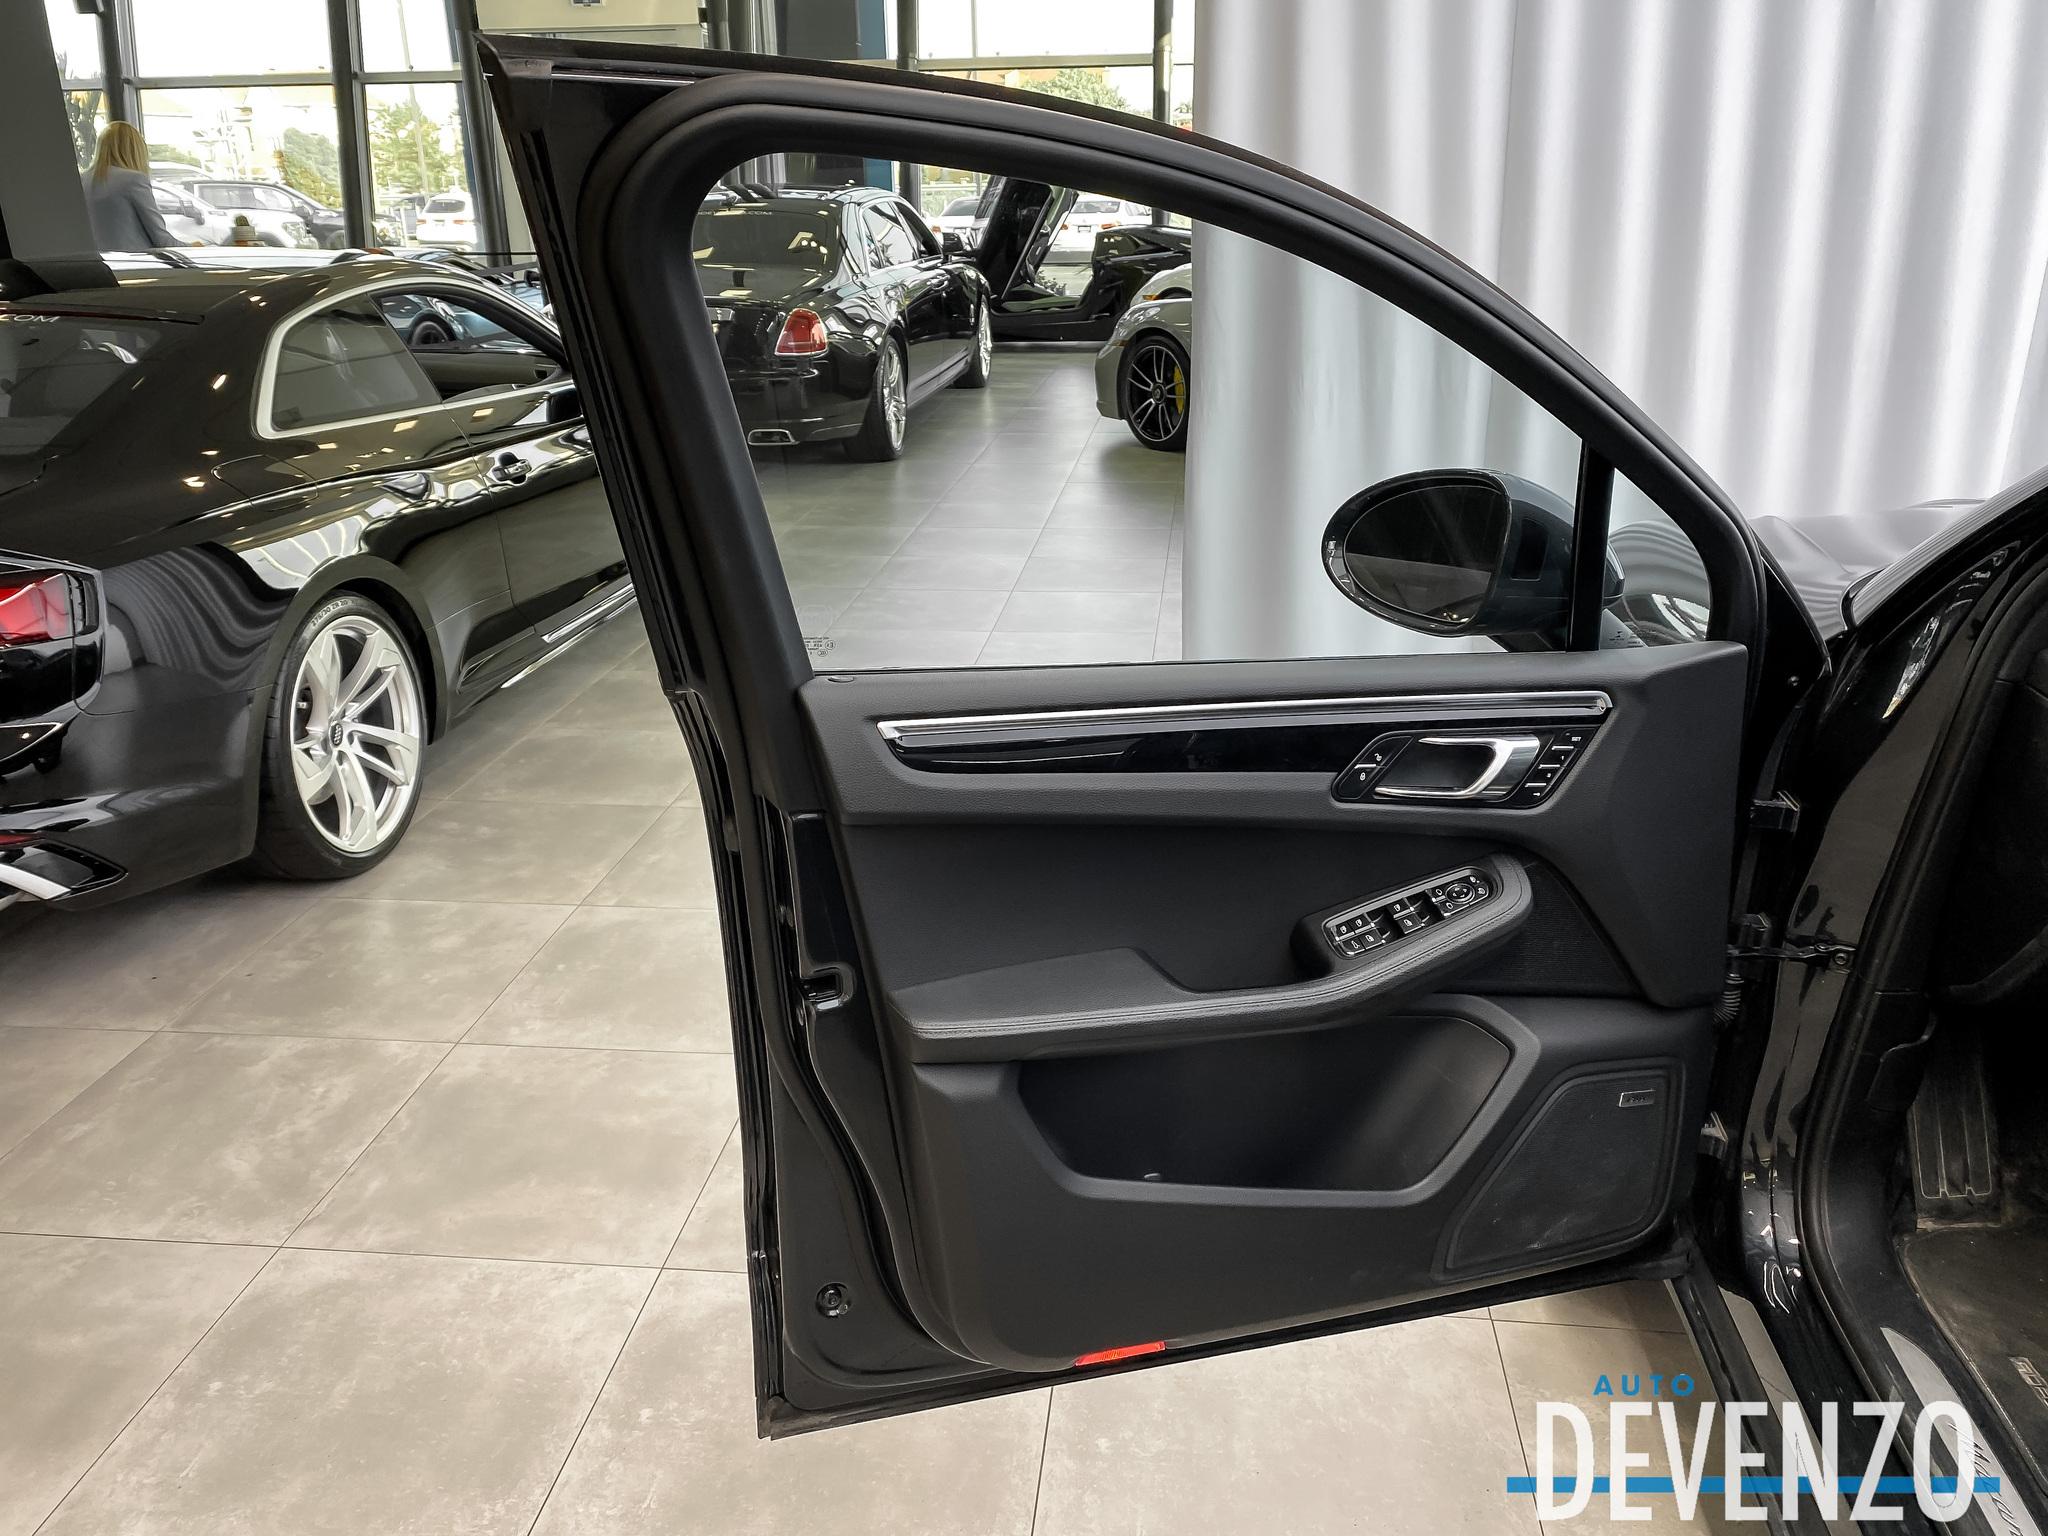 2018 Porsche Macan S AWD 340HP PREMIUM PLUS / 20» Sport Design complet